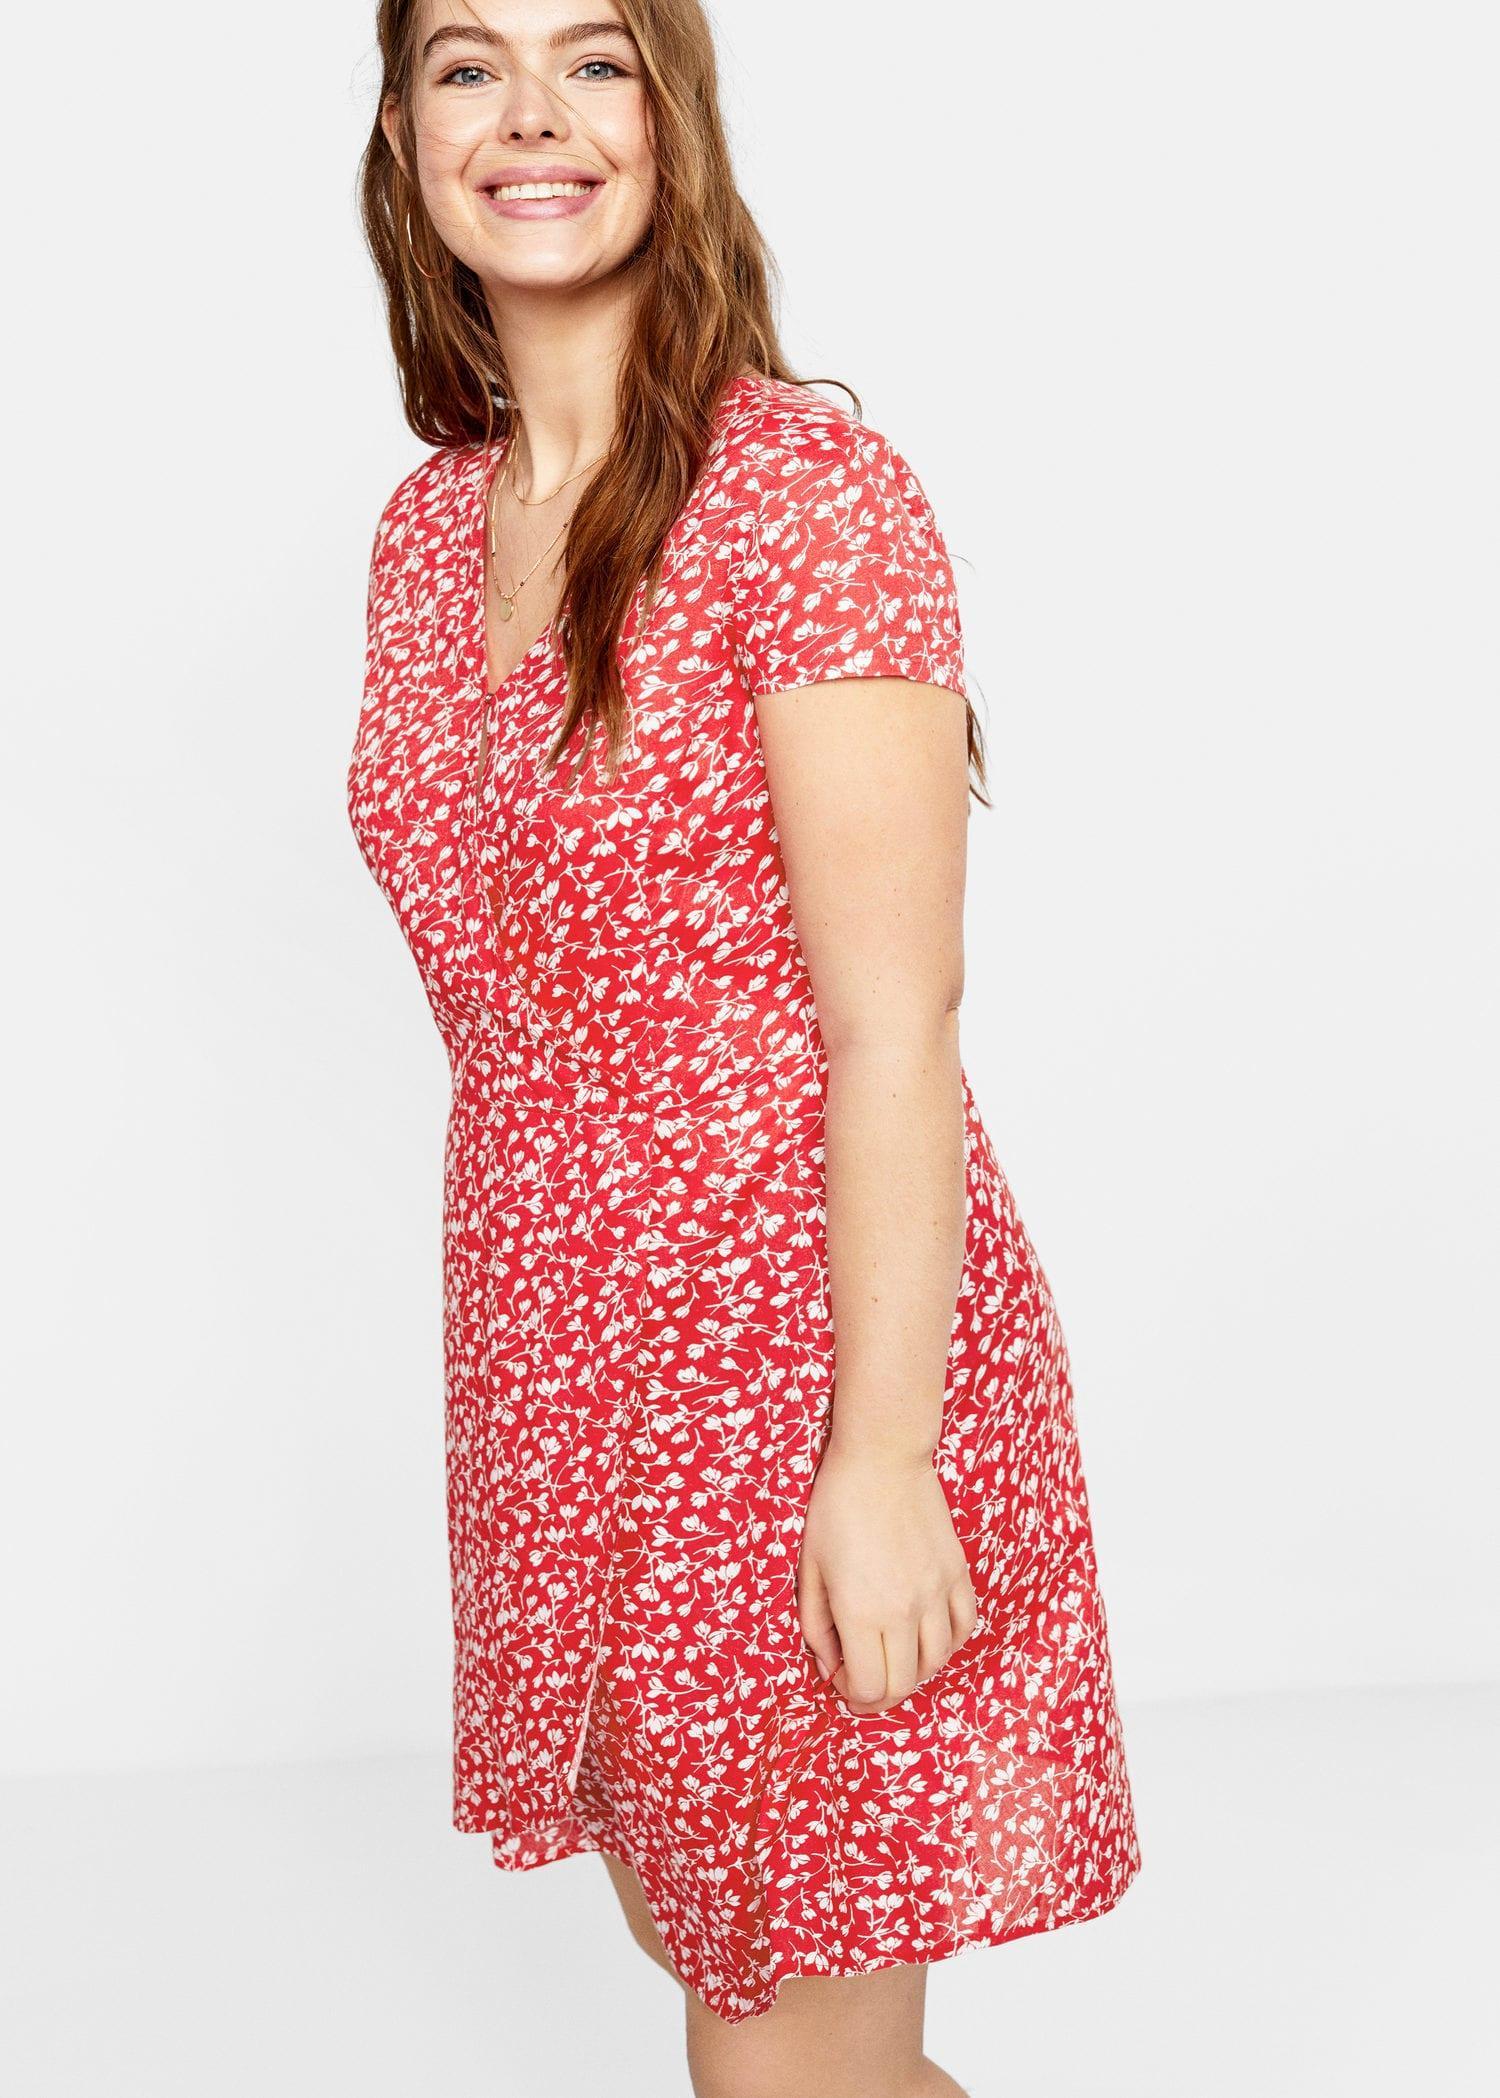 8082f3b4fb5f Violeta by Mango - Red Floral Wrap Dress - Lyst. View fullscreen